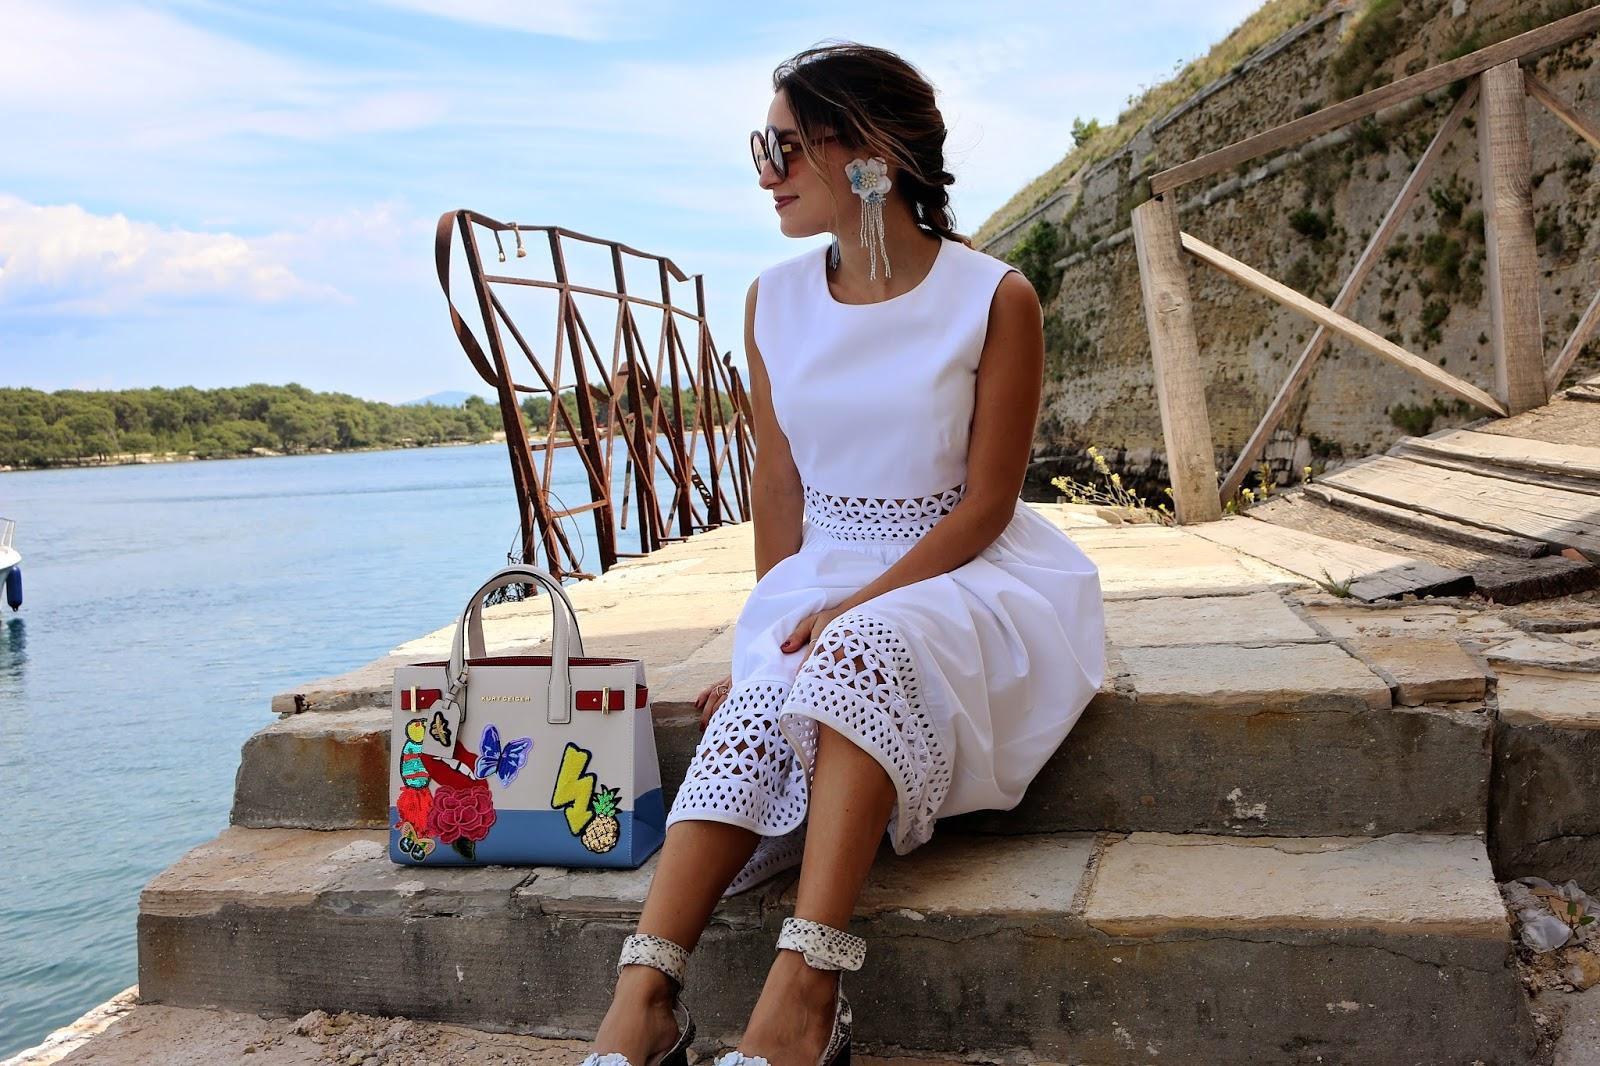 Whitney's Wonderland's Whitney Valverde UK Top Fashion Blogger wears Ted Baker cut work white midi dress, Kurt Geiger saffiano tropical embellished bag and flatforms in Sibenik, Croatia.